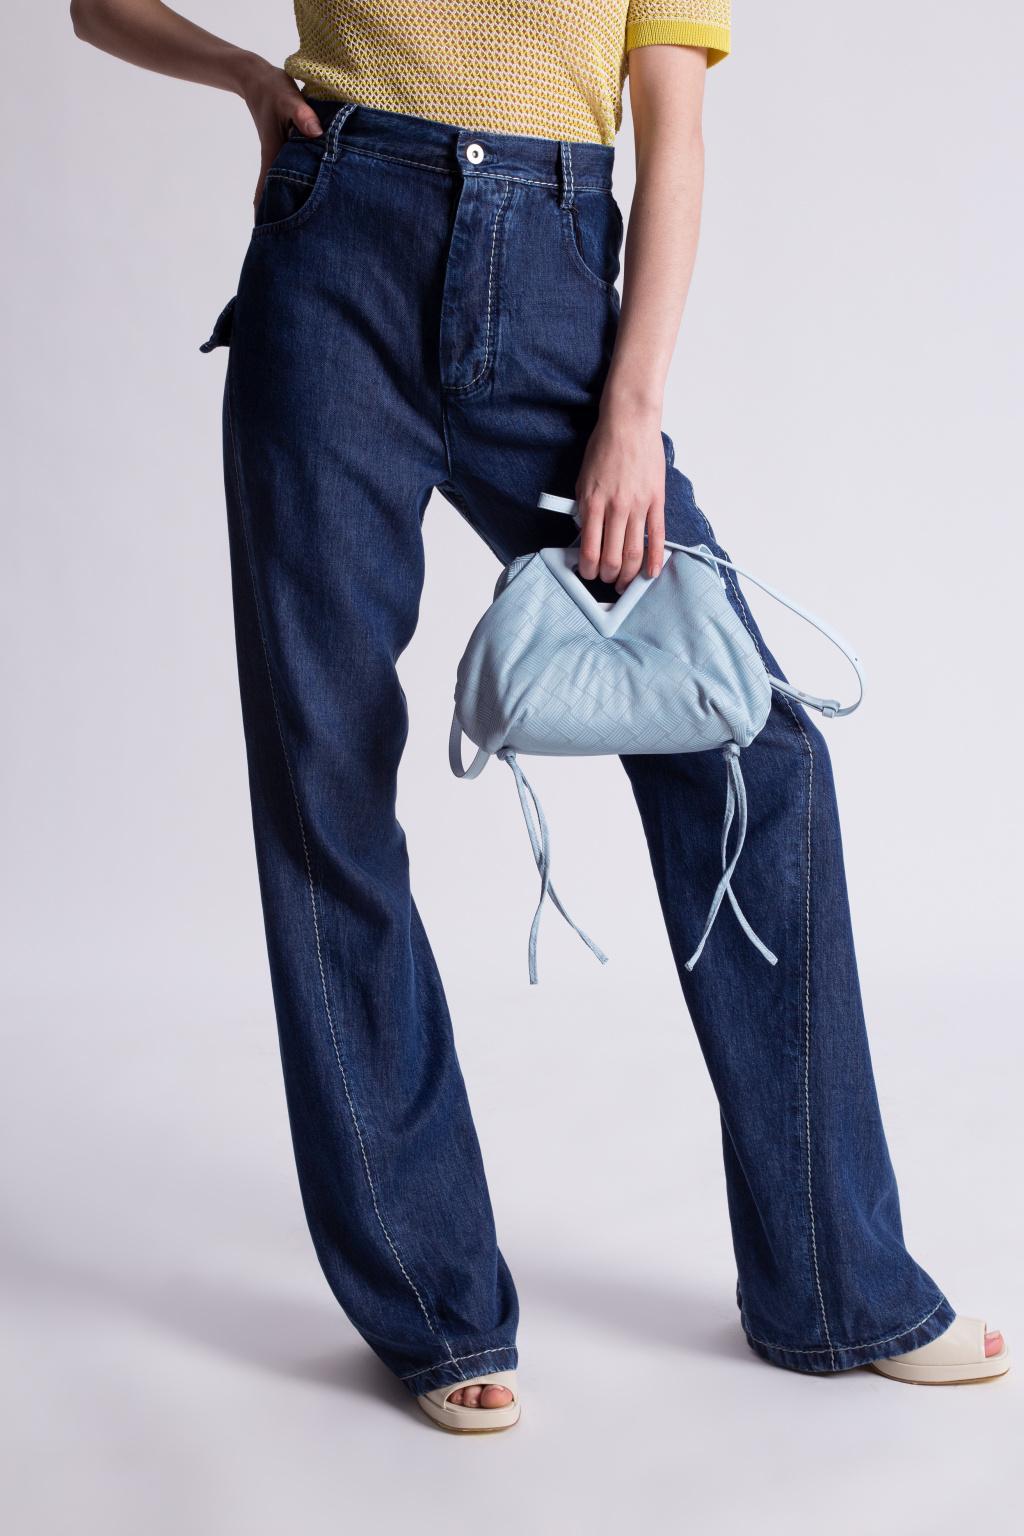 Bottega Veneta 'The Point' shoulder bag